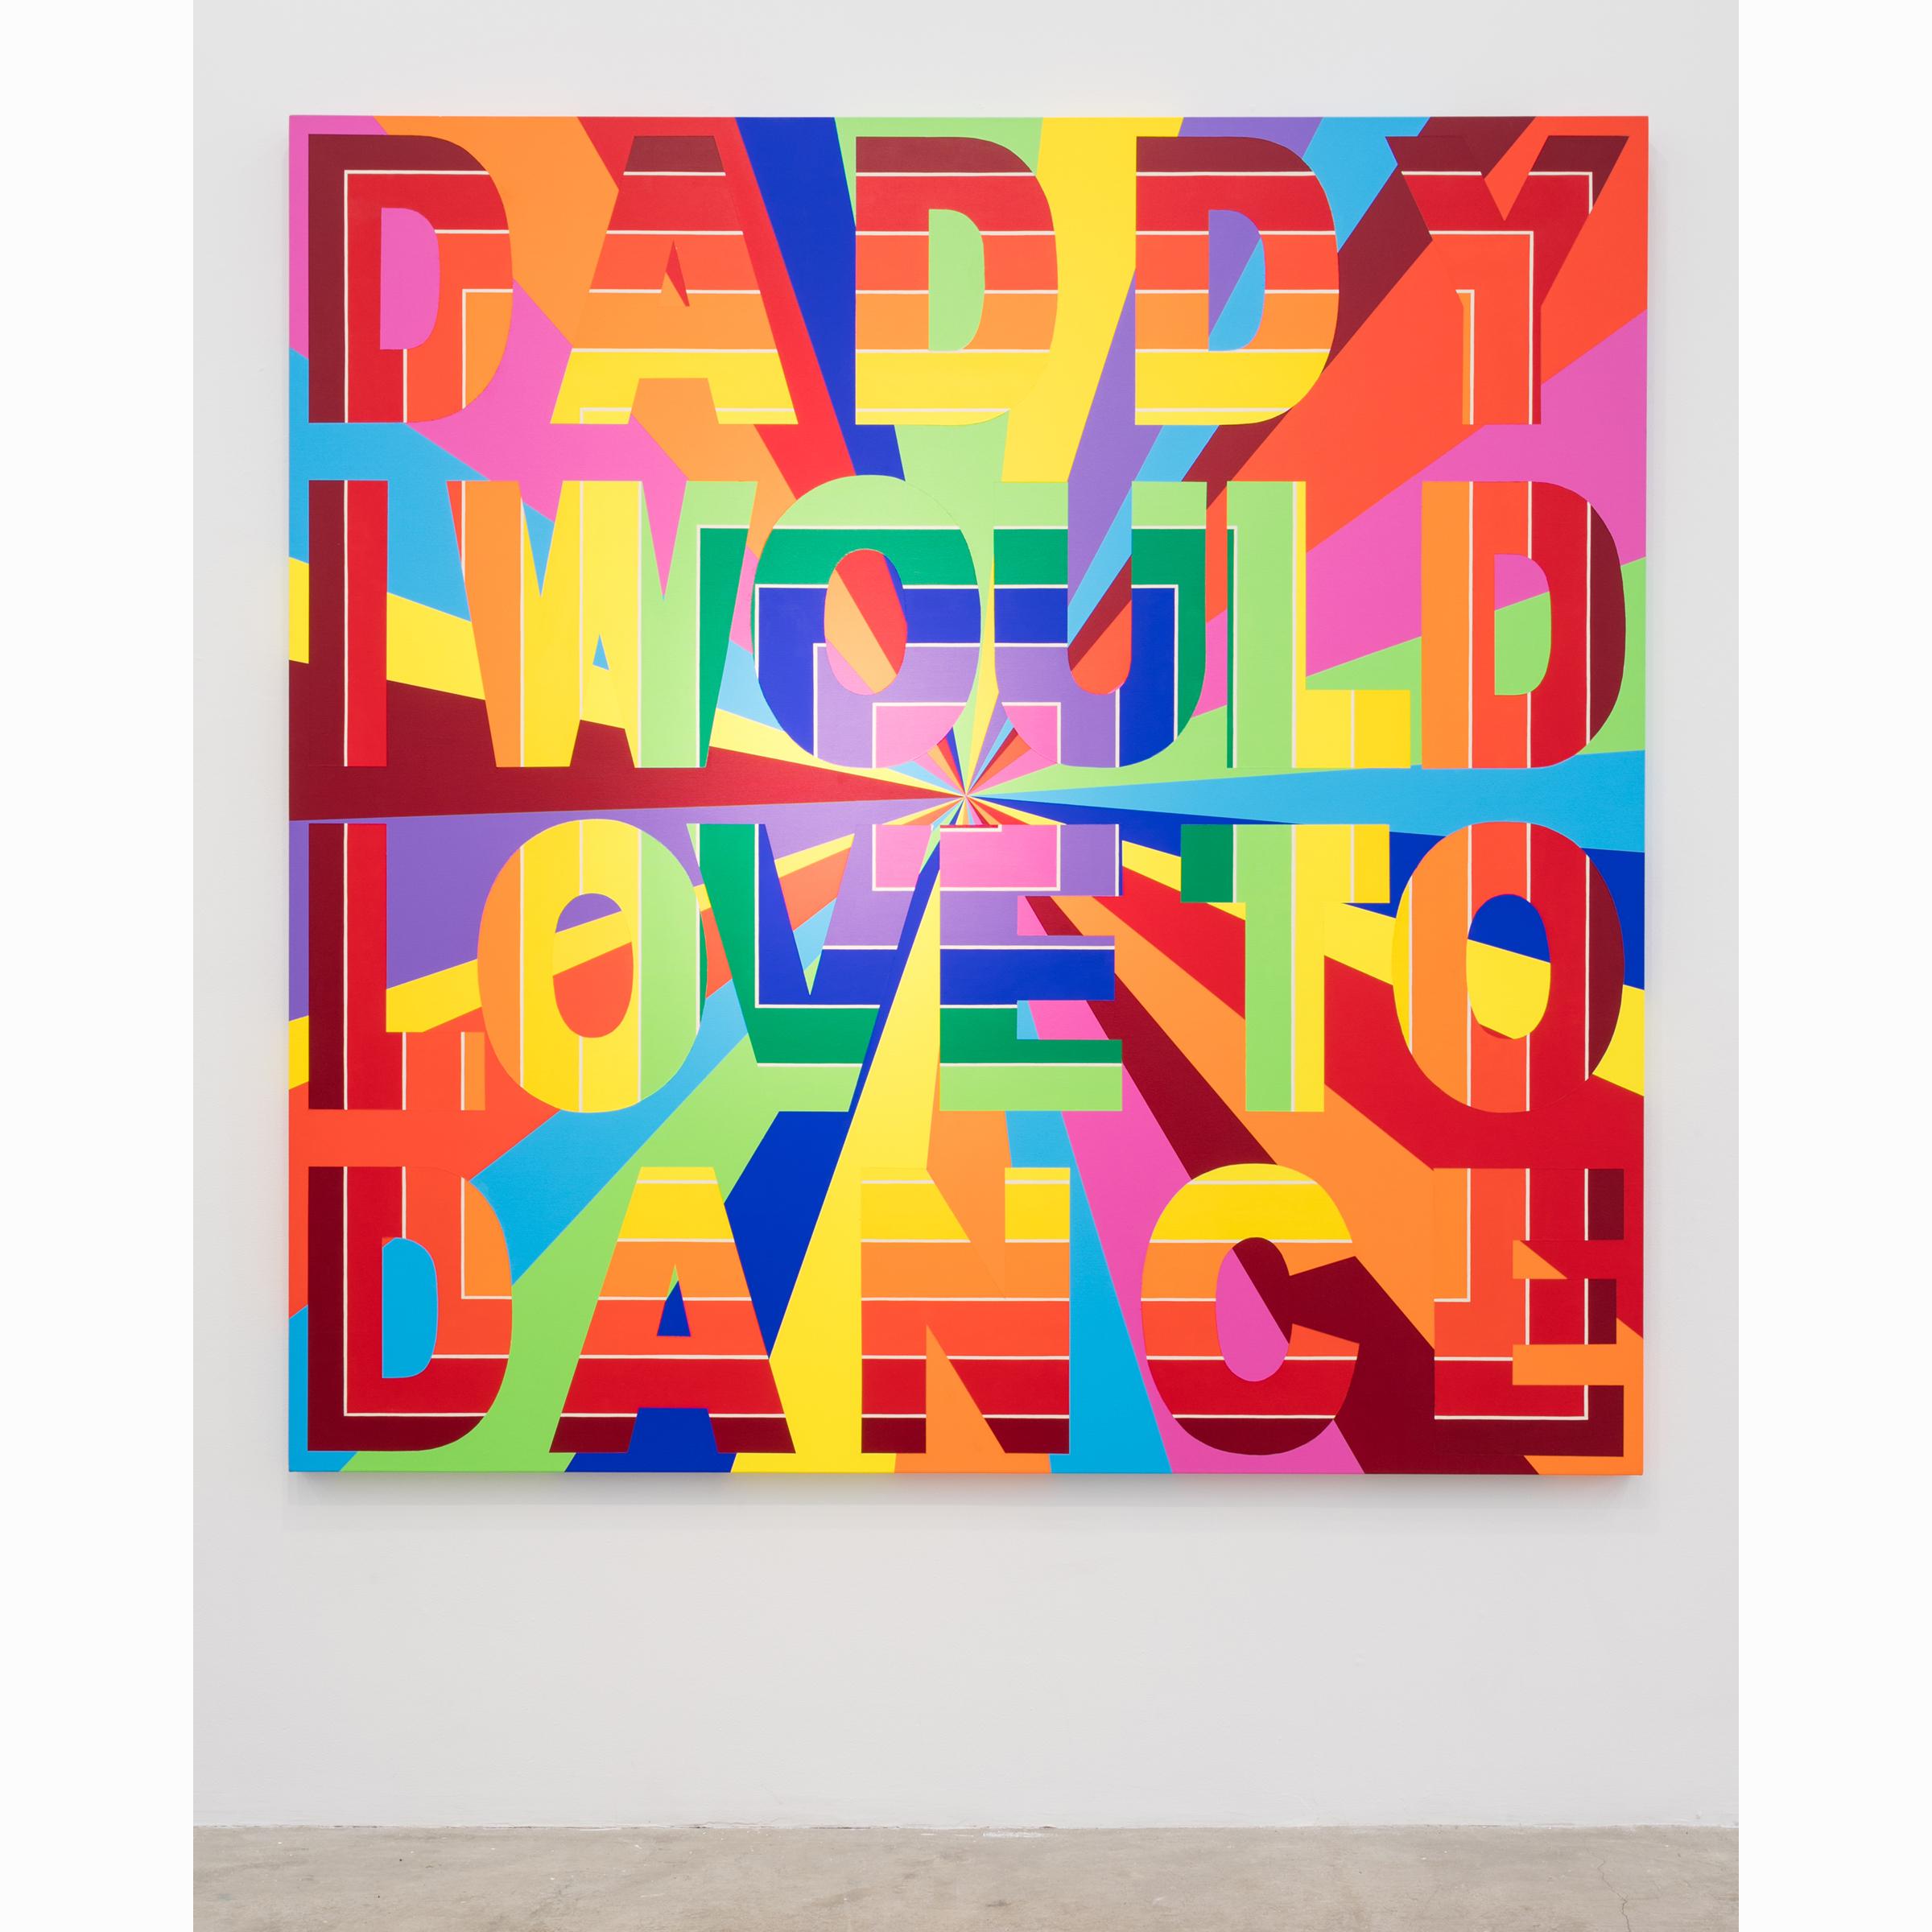 Deborah Kass, Daddy , 2008,acrylic on canvas,78 x 78 in,Courtesy the Artist and Paul Kasmin Gallery, New York